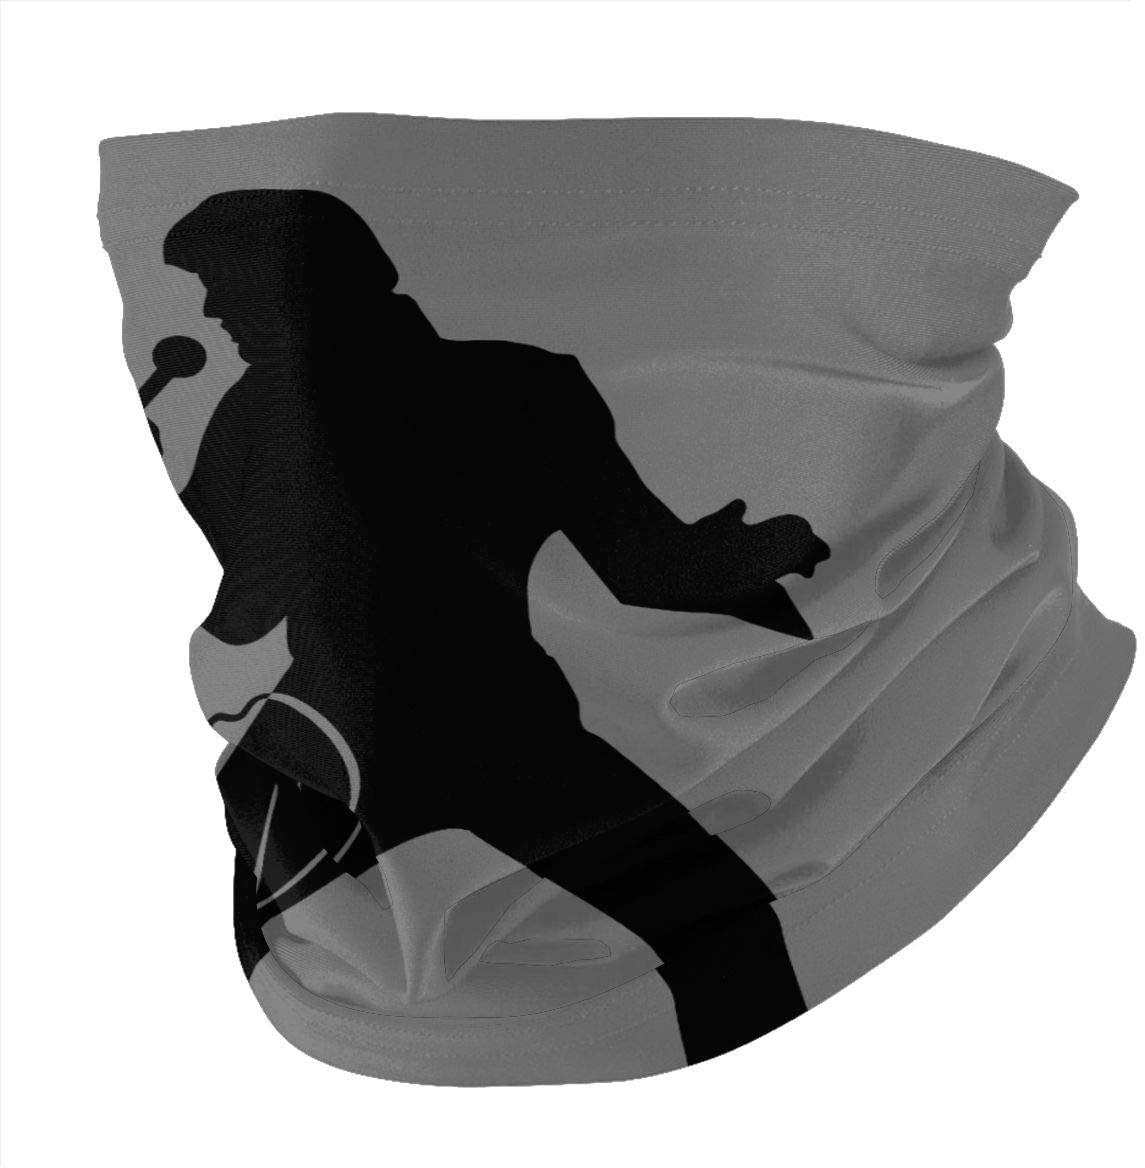 Qwertyi Elvis Presley Face Head Scarf Scarves Variety Scarf Magic Headwear of Unisex